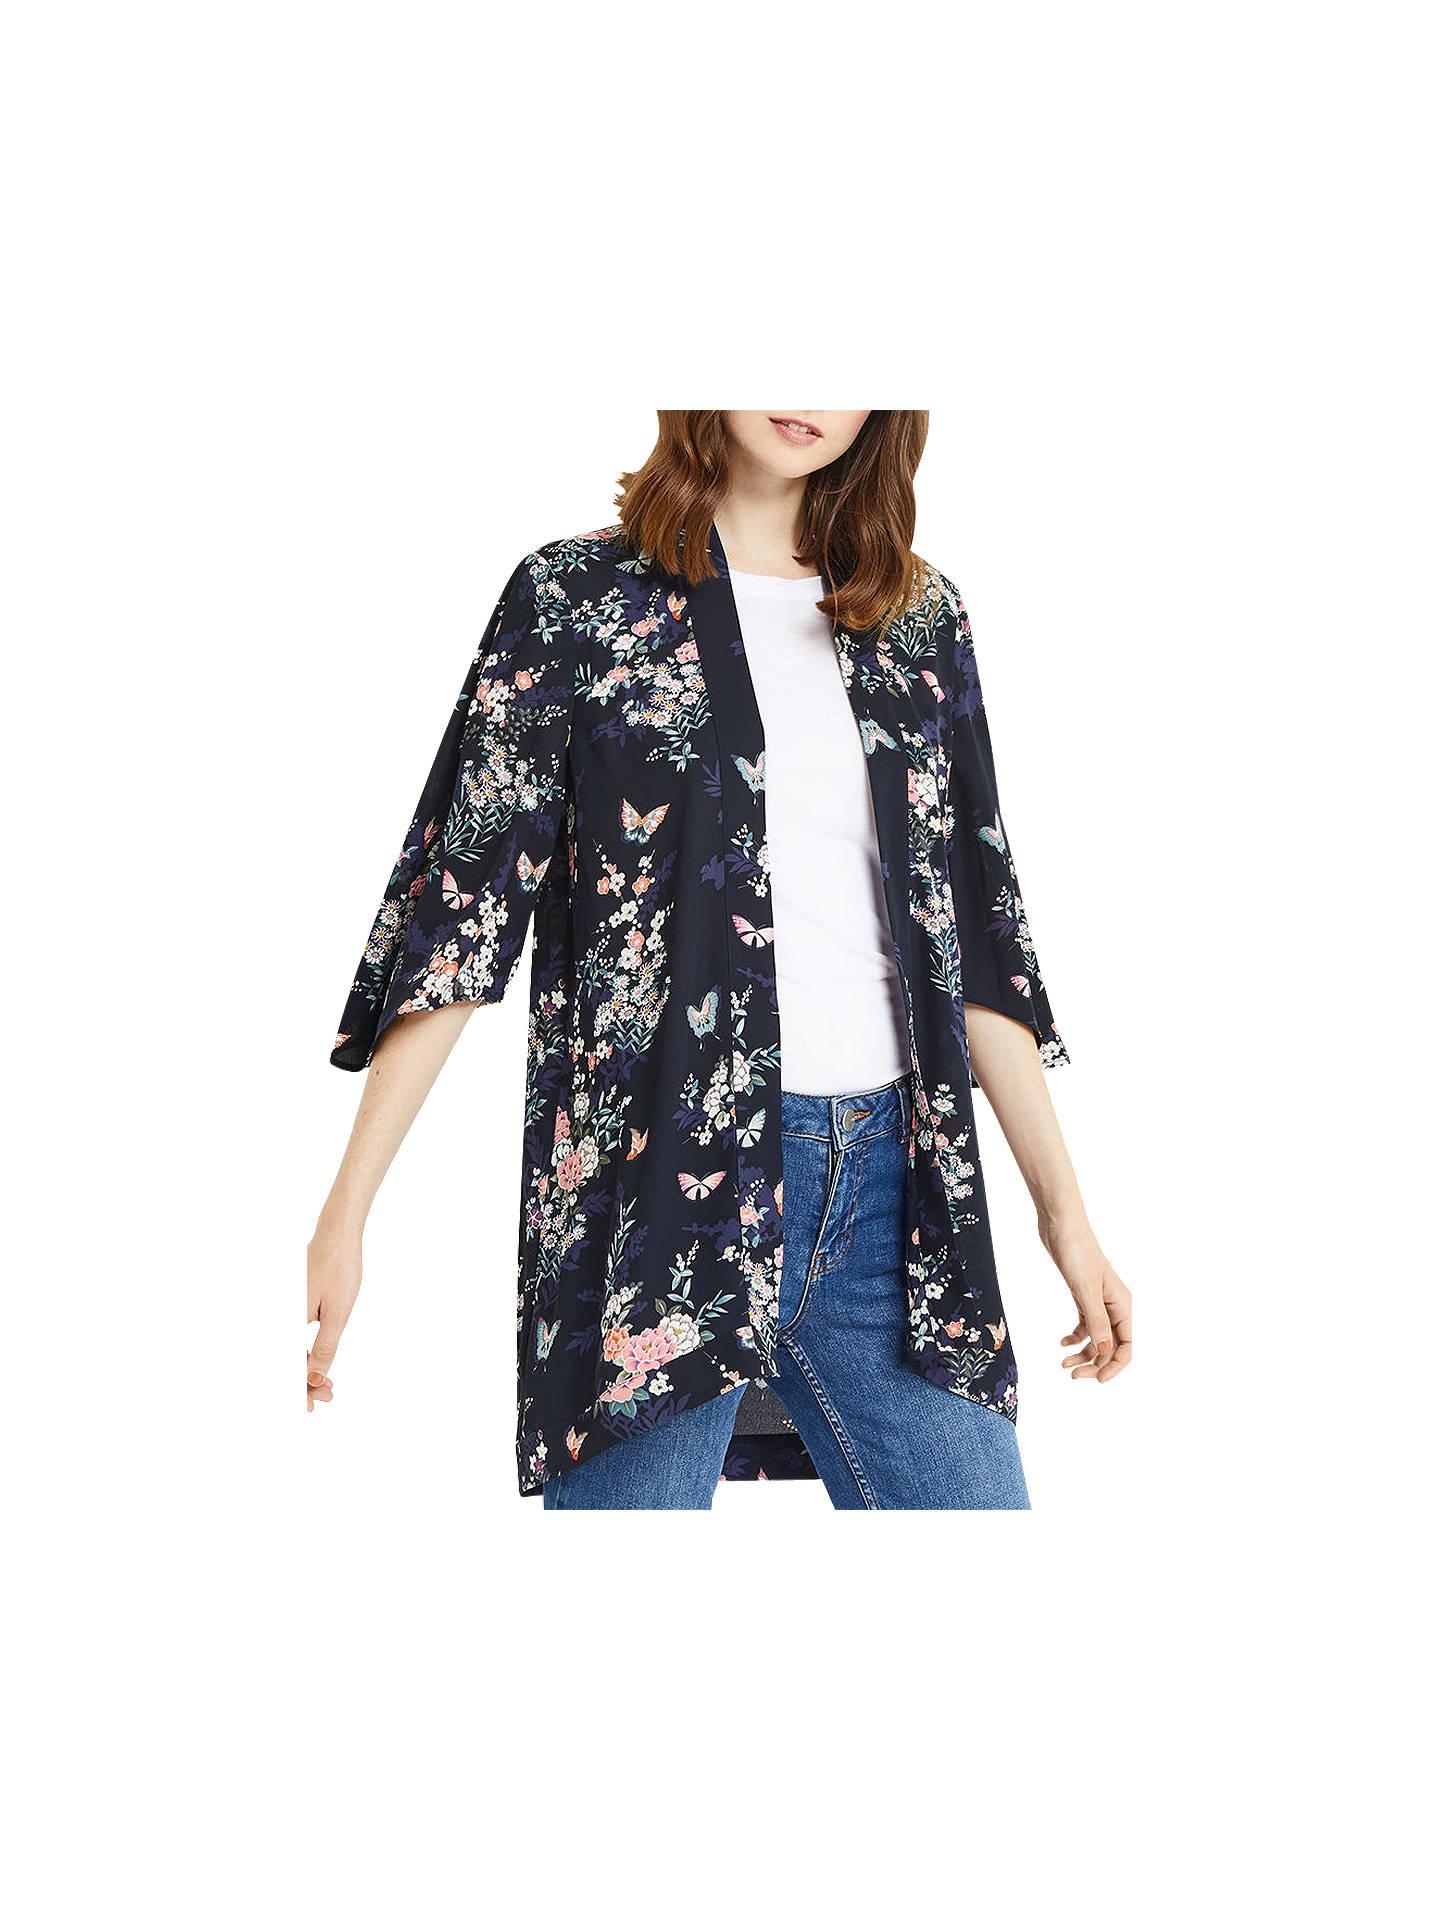 cc0ff5d809a6 Buy Oasis Katrina Oriental Kimono, Multi, 6 Online at johnlewis.com ...